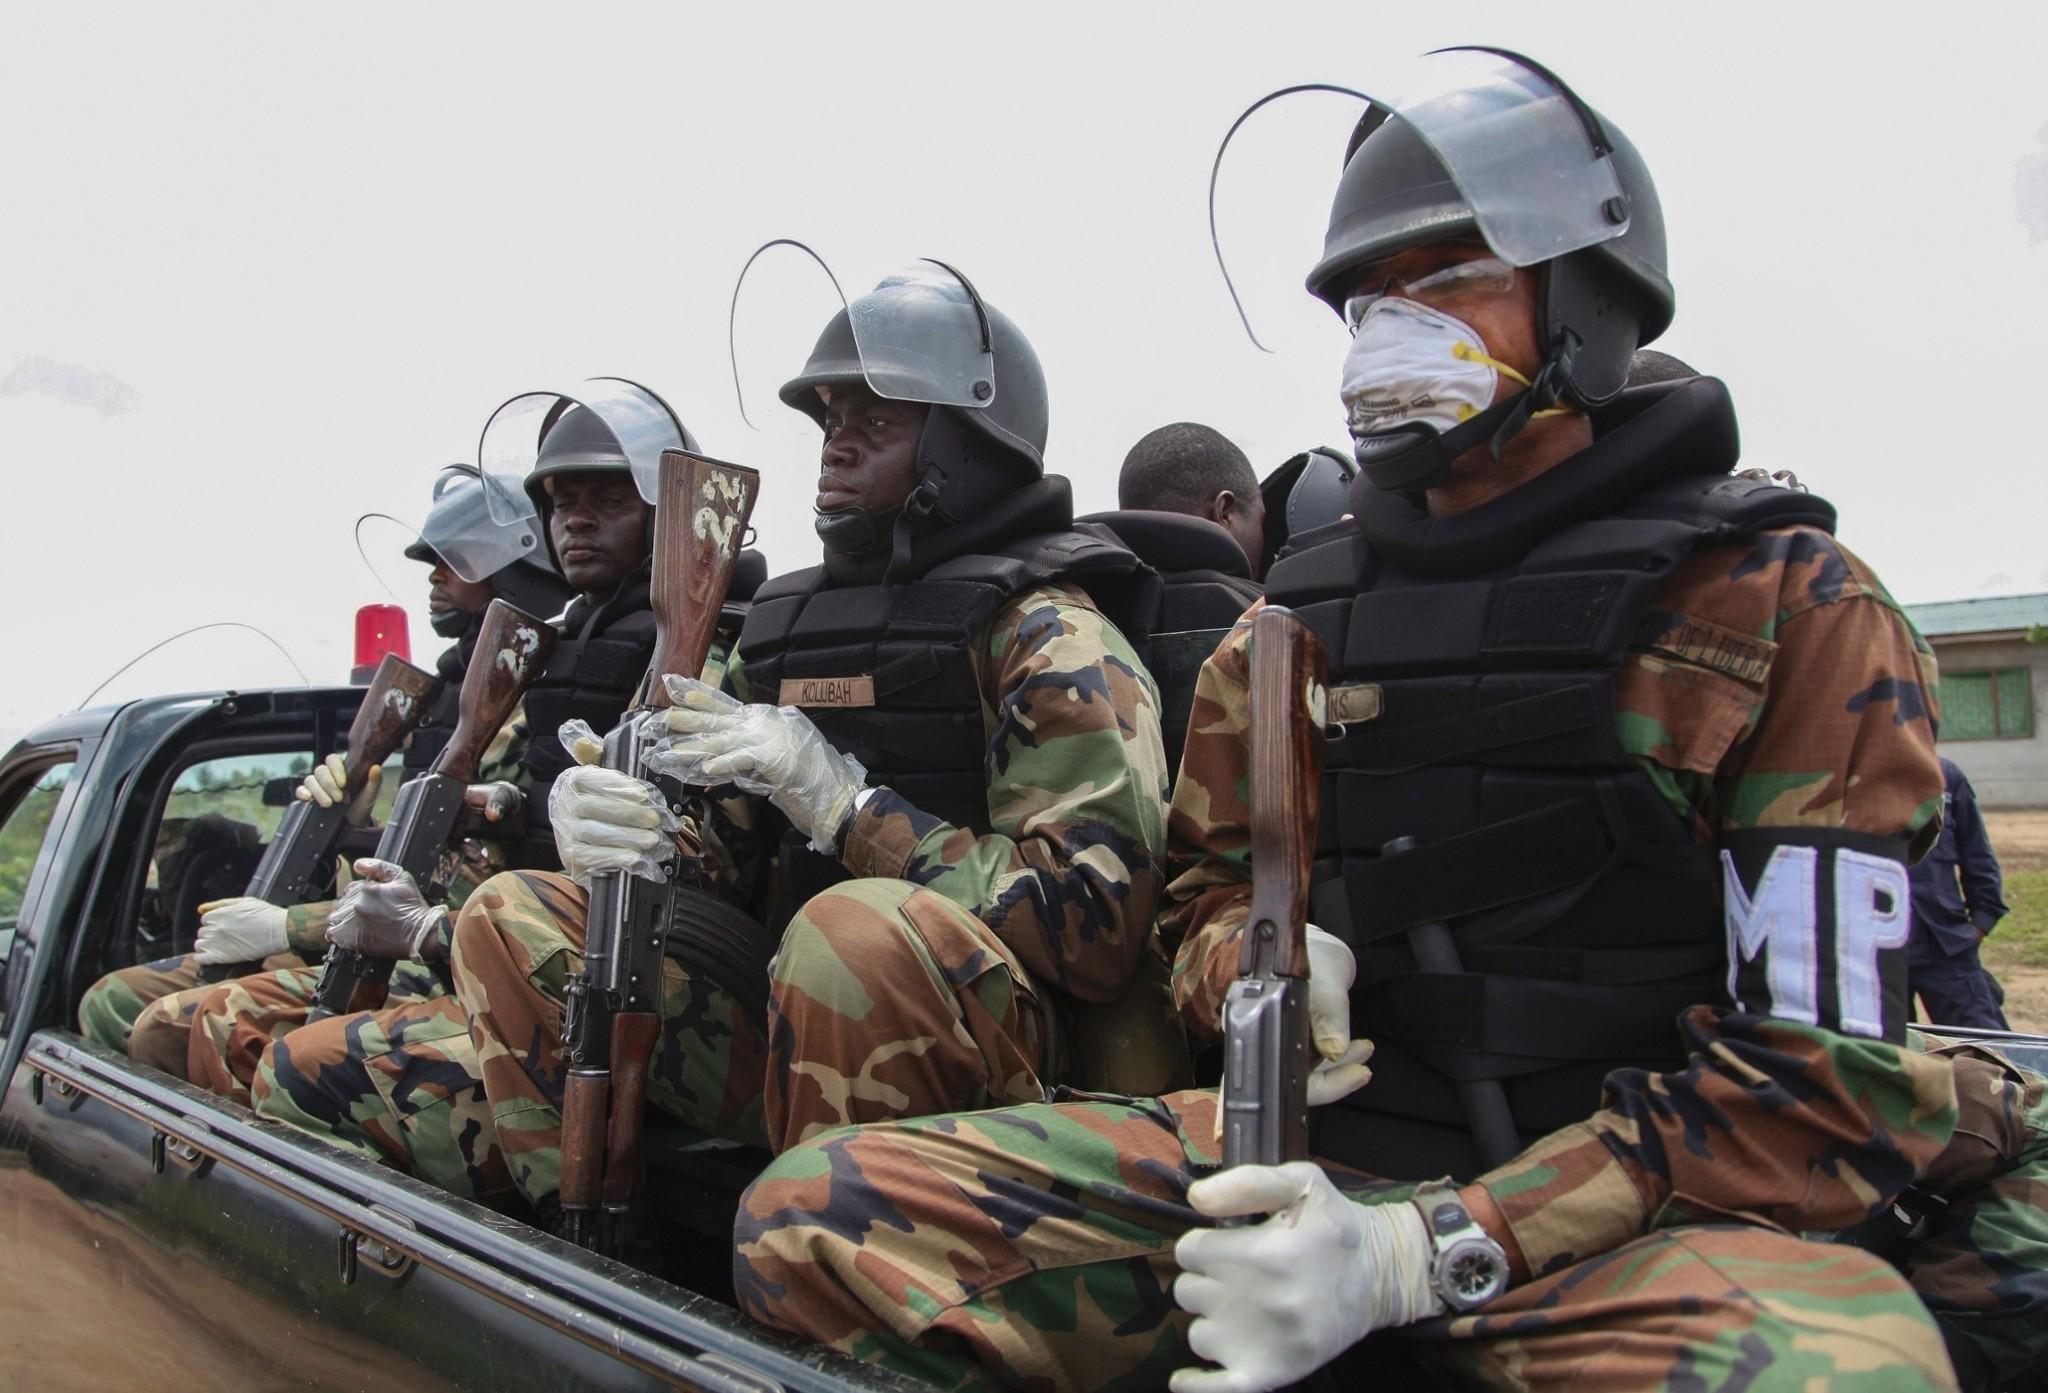 Ebola outbreak precautions - in pictures